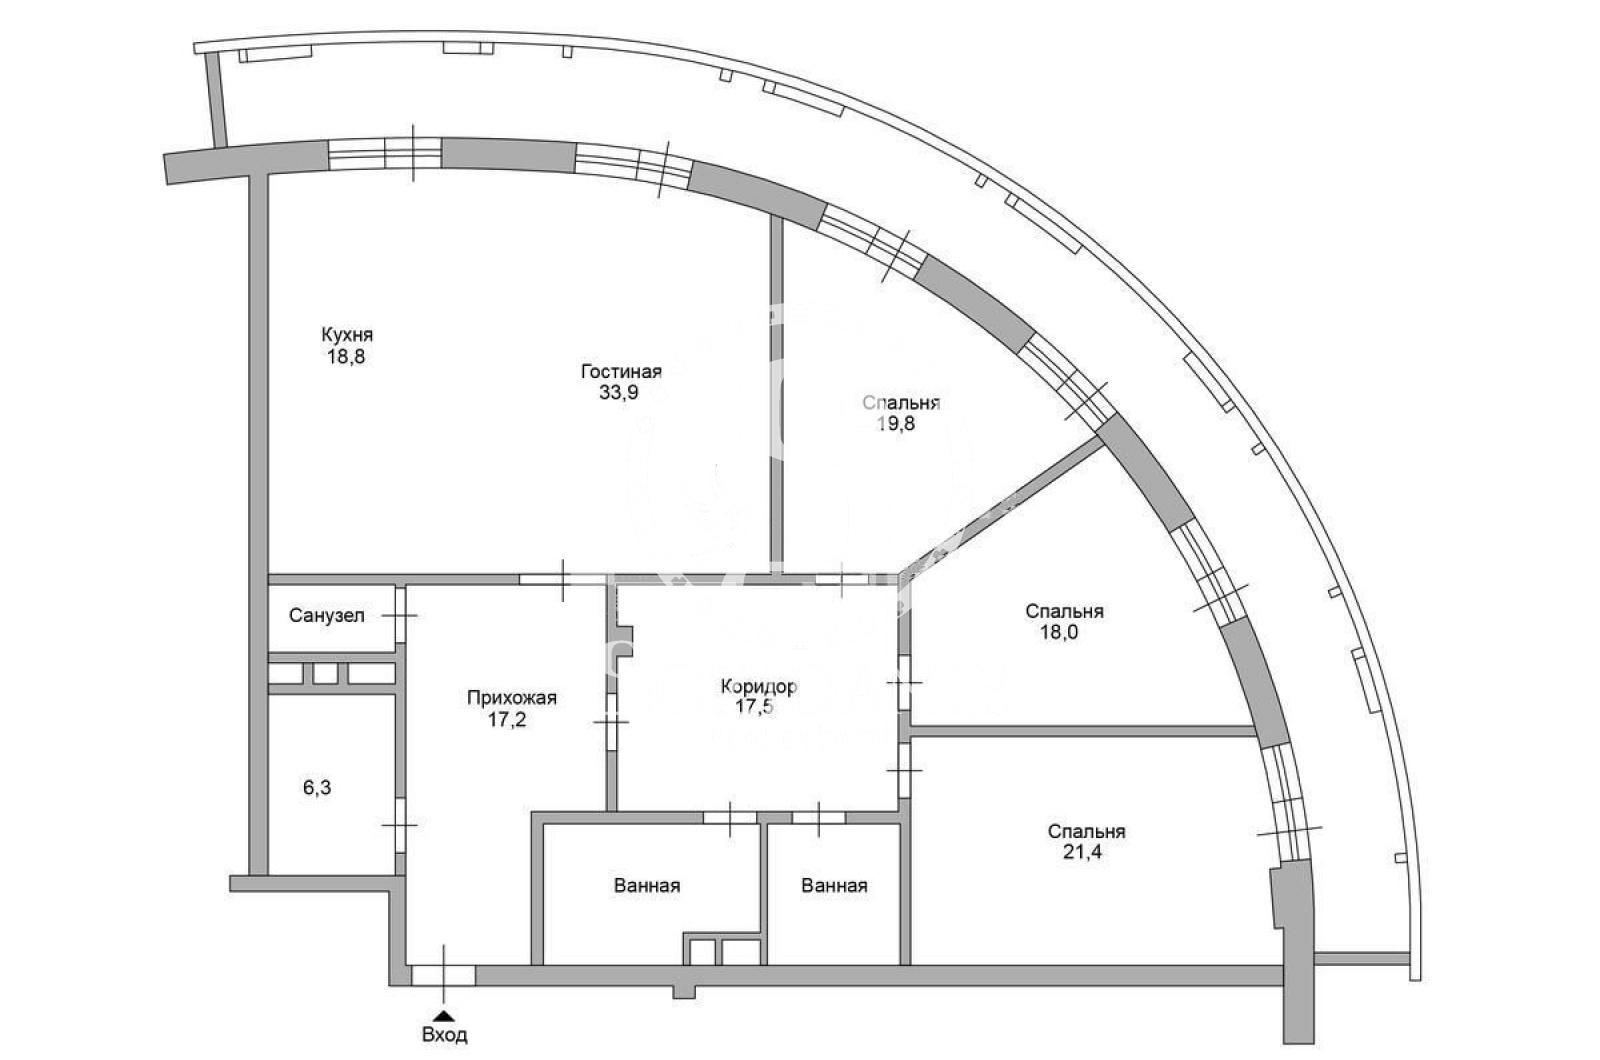 4 Комнаты, Городская, Продажа, Озерковская набережная, Listing ID 3458, Москва, Россия,